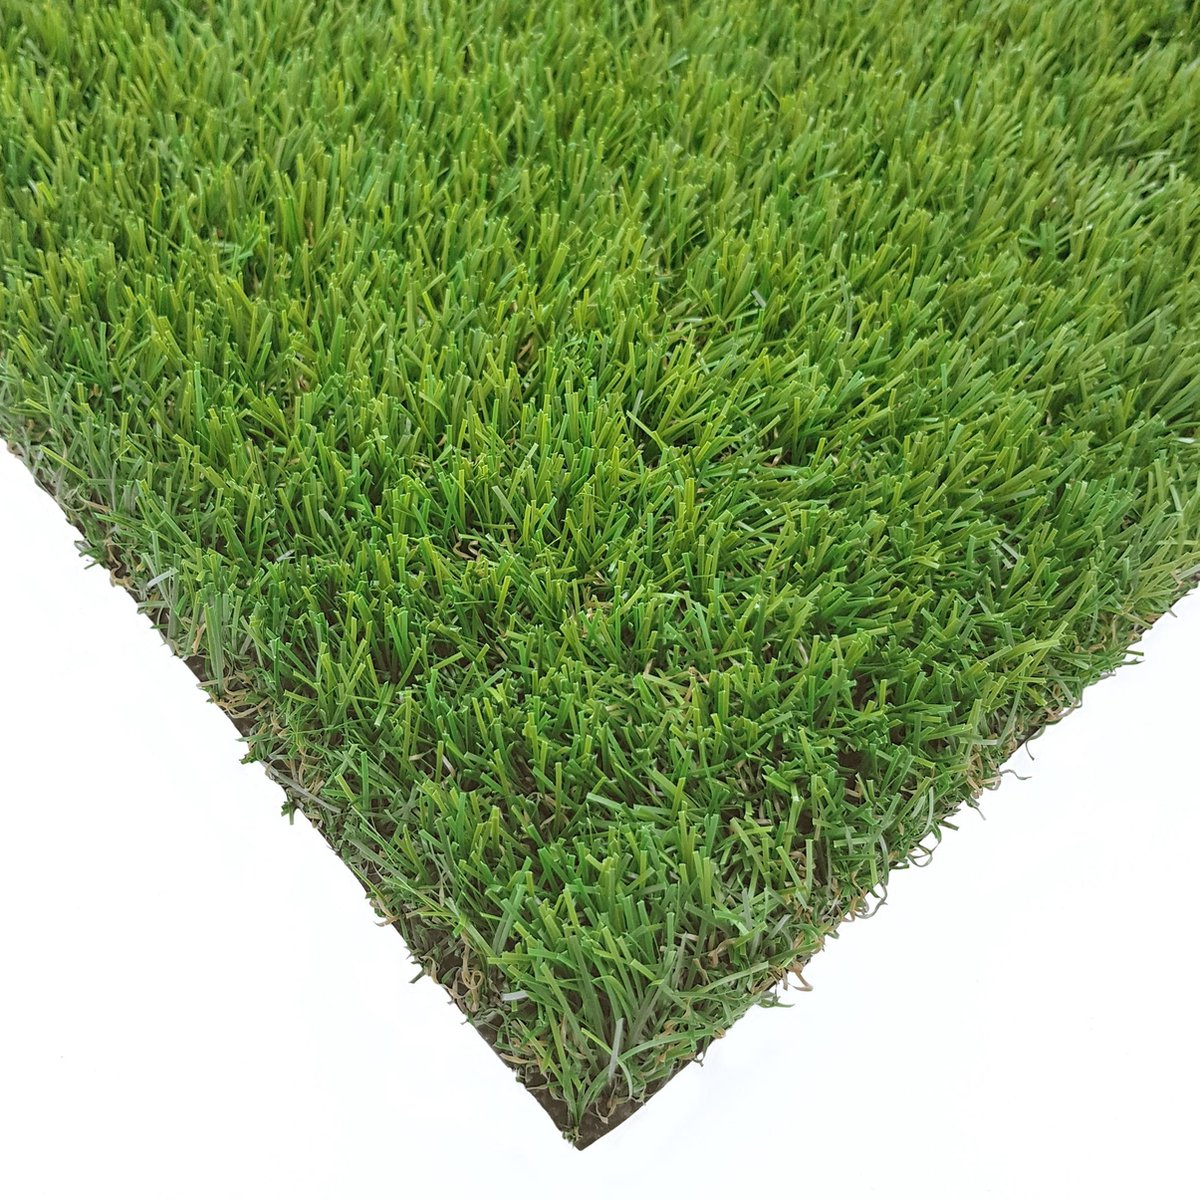 Kunstgras Tapijt DENVER groen - 100x200cm - 25mm artificial grass gazon artificiel groen tuin balkon